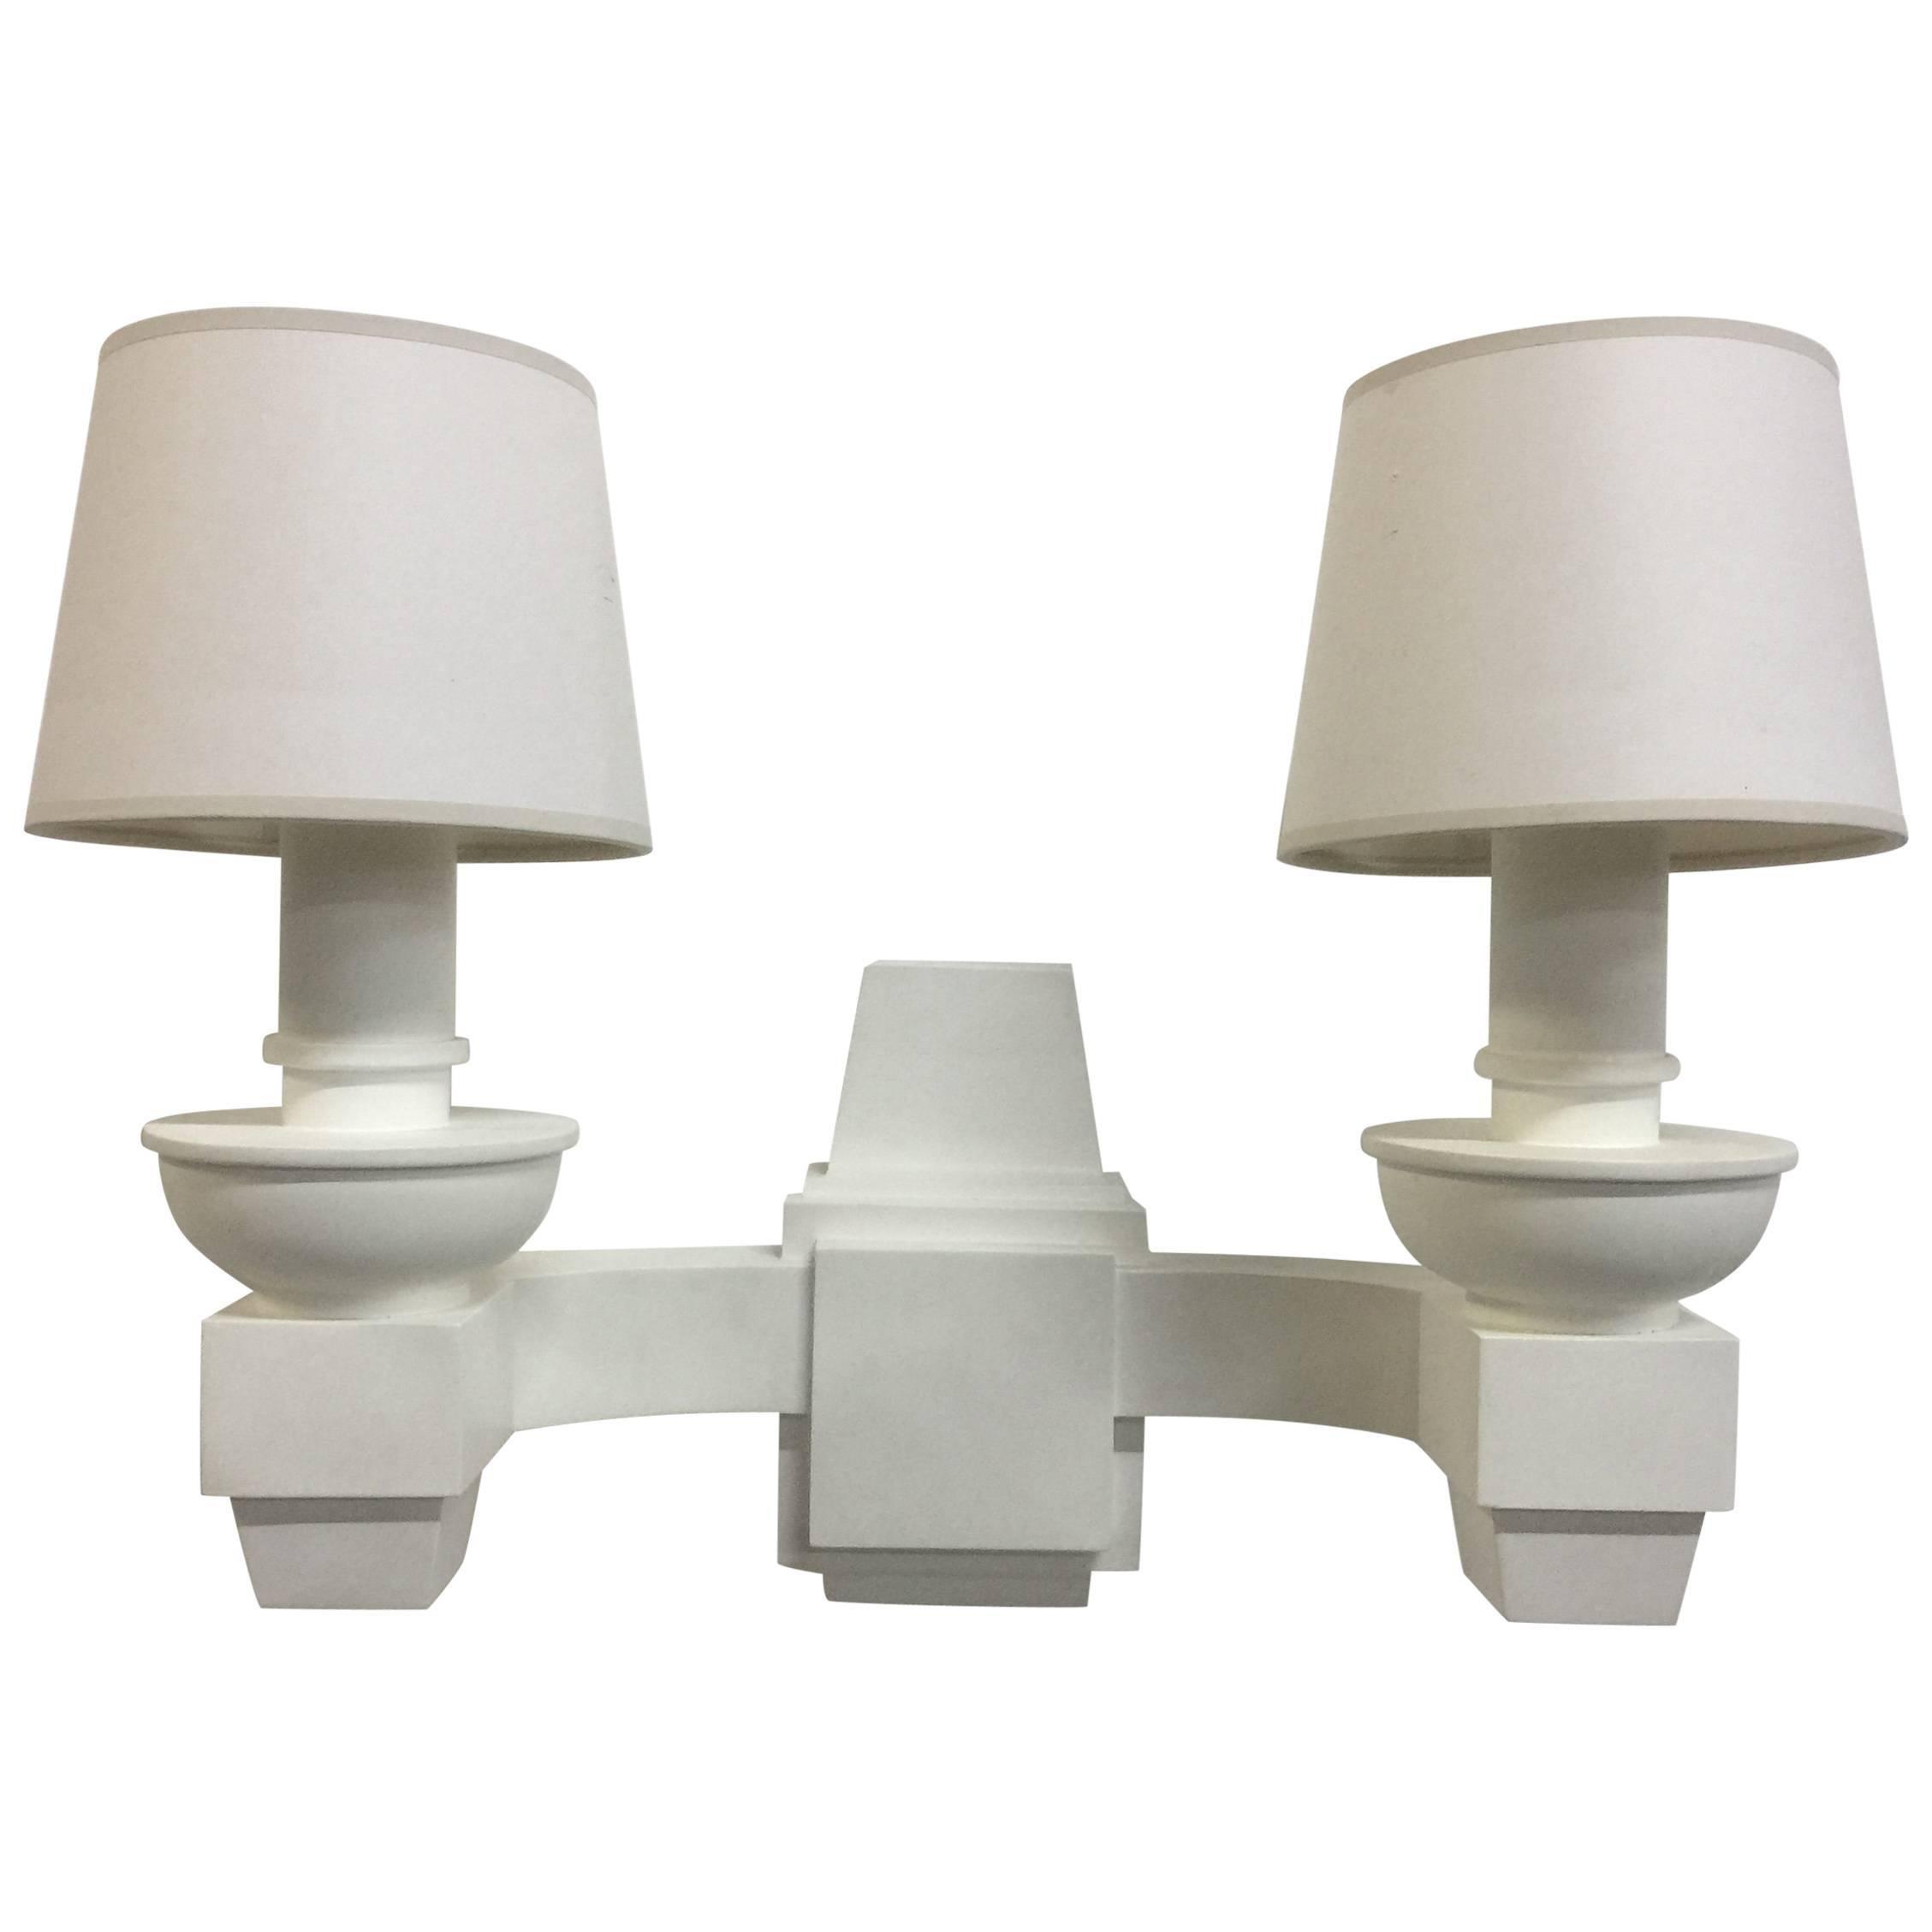 Arbus Style Double-Arm Wall Sconces,Pair